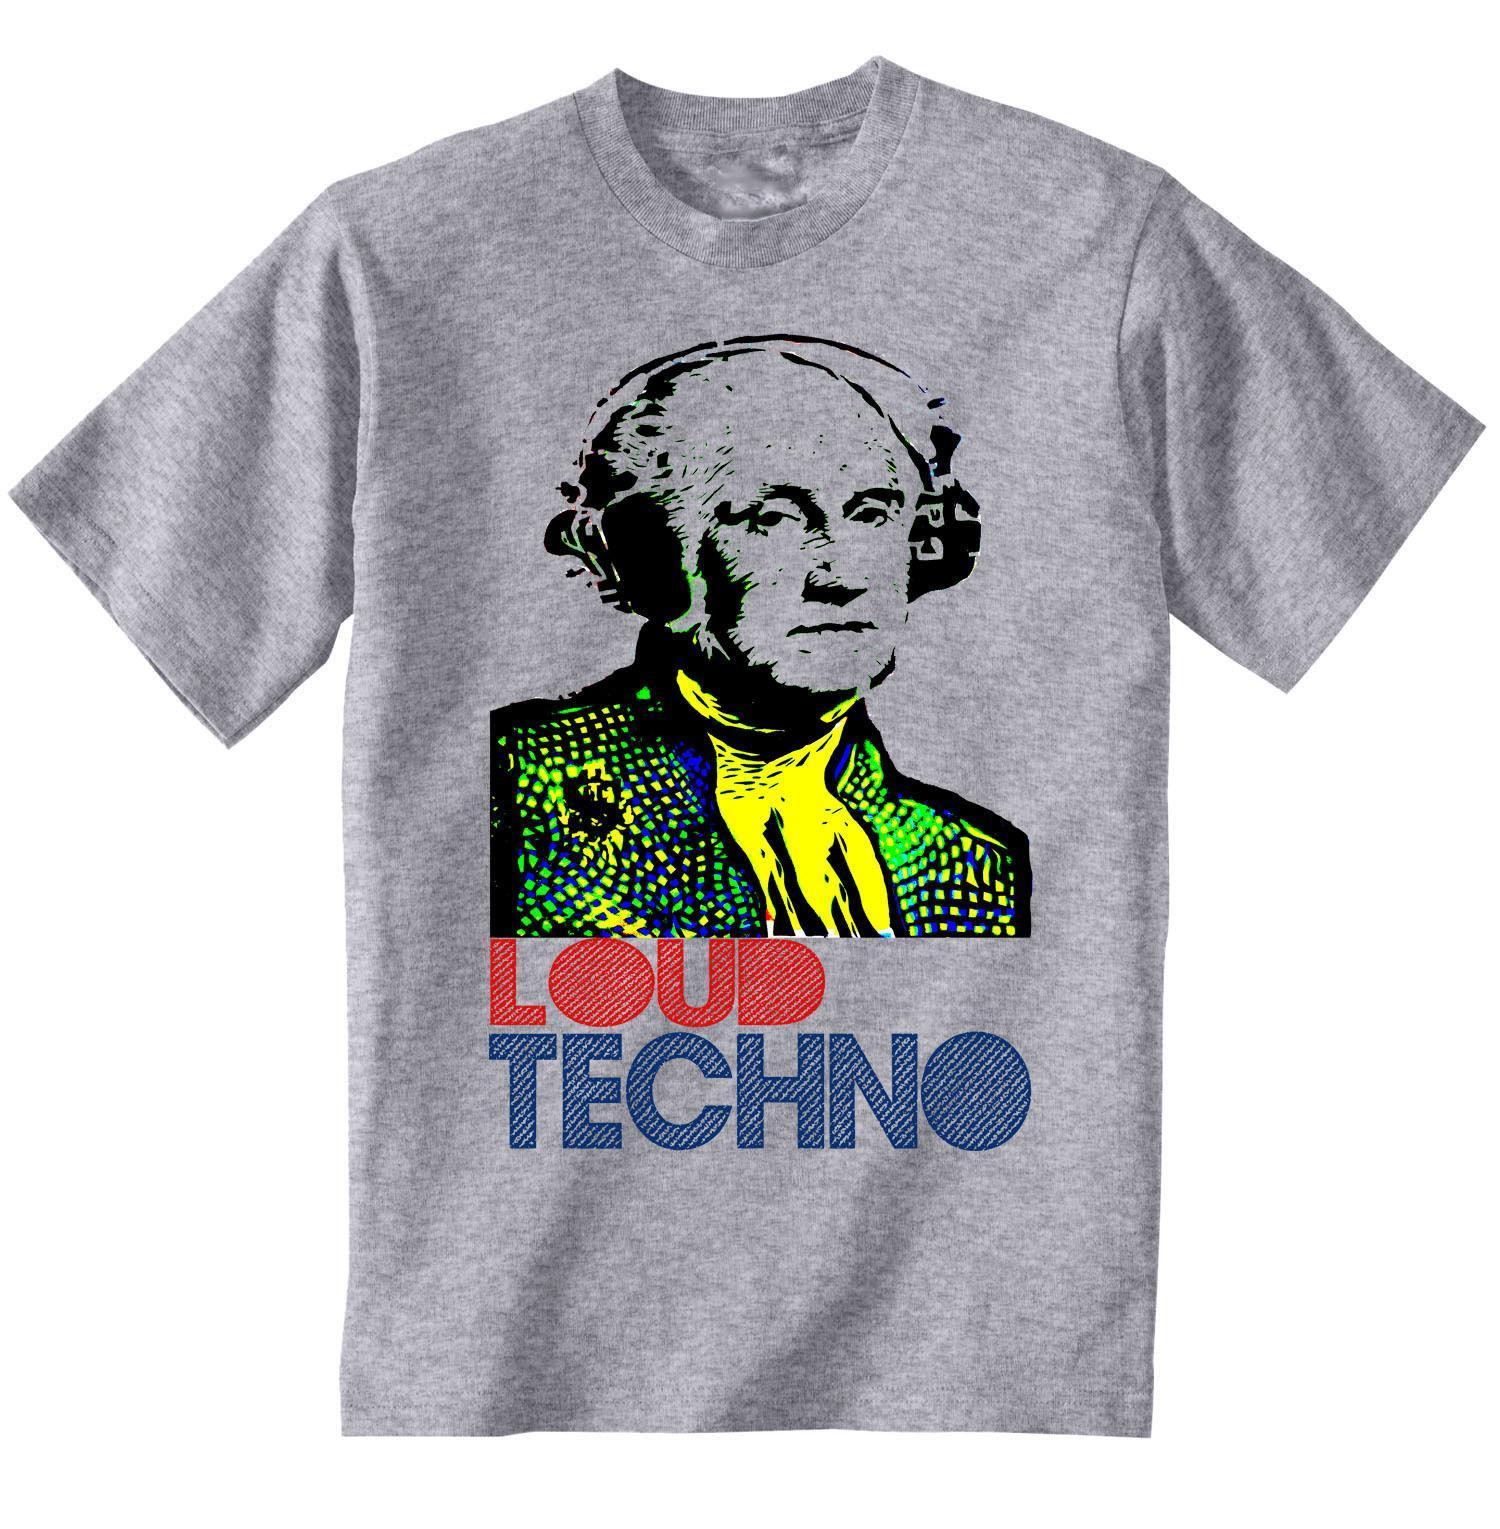 TECHNO MUSIC - NEW COTTON GREY TSHIRT Summer Fashion O-Neck Top Quality  Cotton Casual Men T Shirts Men Free Shipping